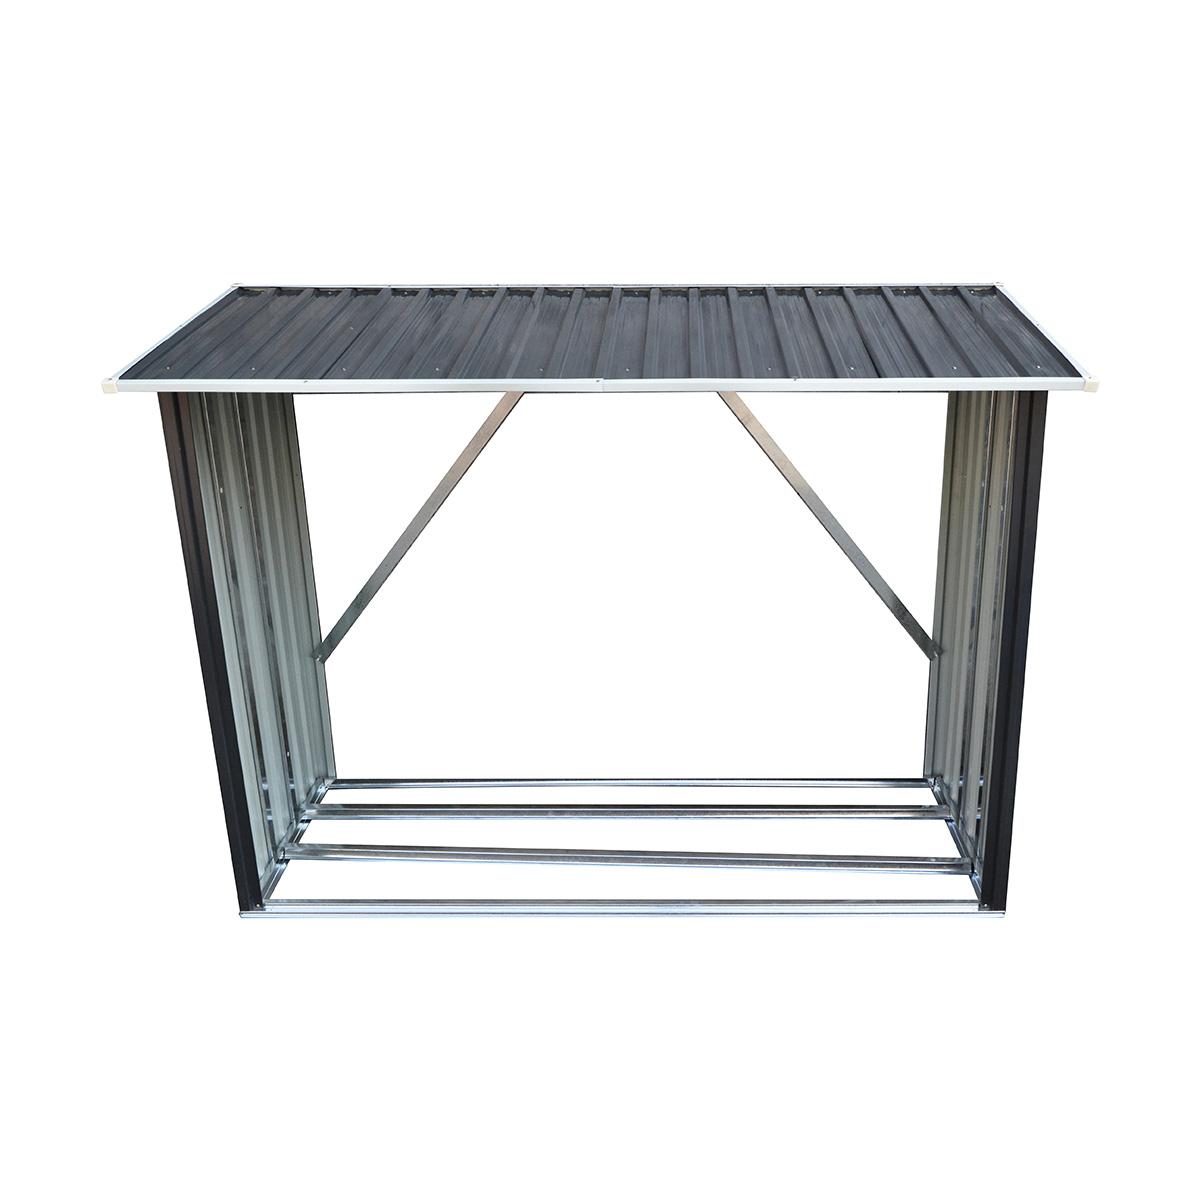 abri b ches miel en bois 119x148x69cm vendu par rueducommerce 148142. Black Bedroom Furniture Sets. Home Design Ideas